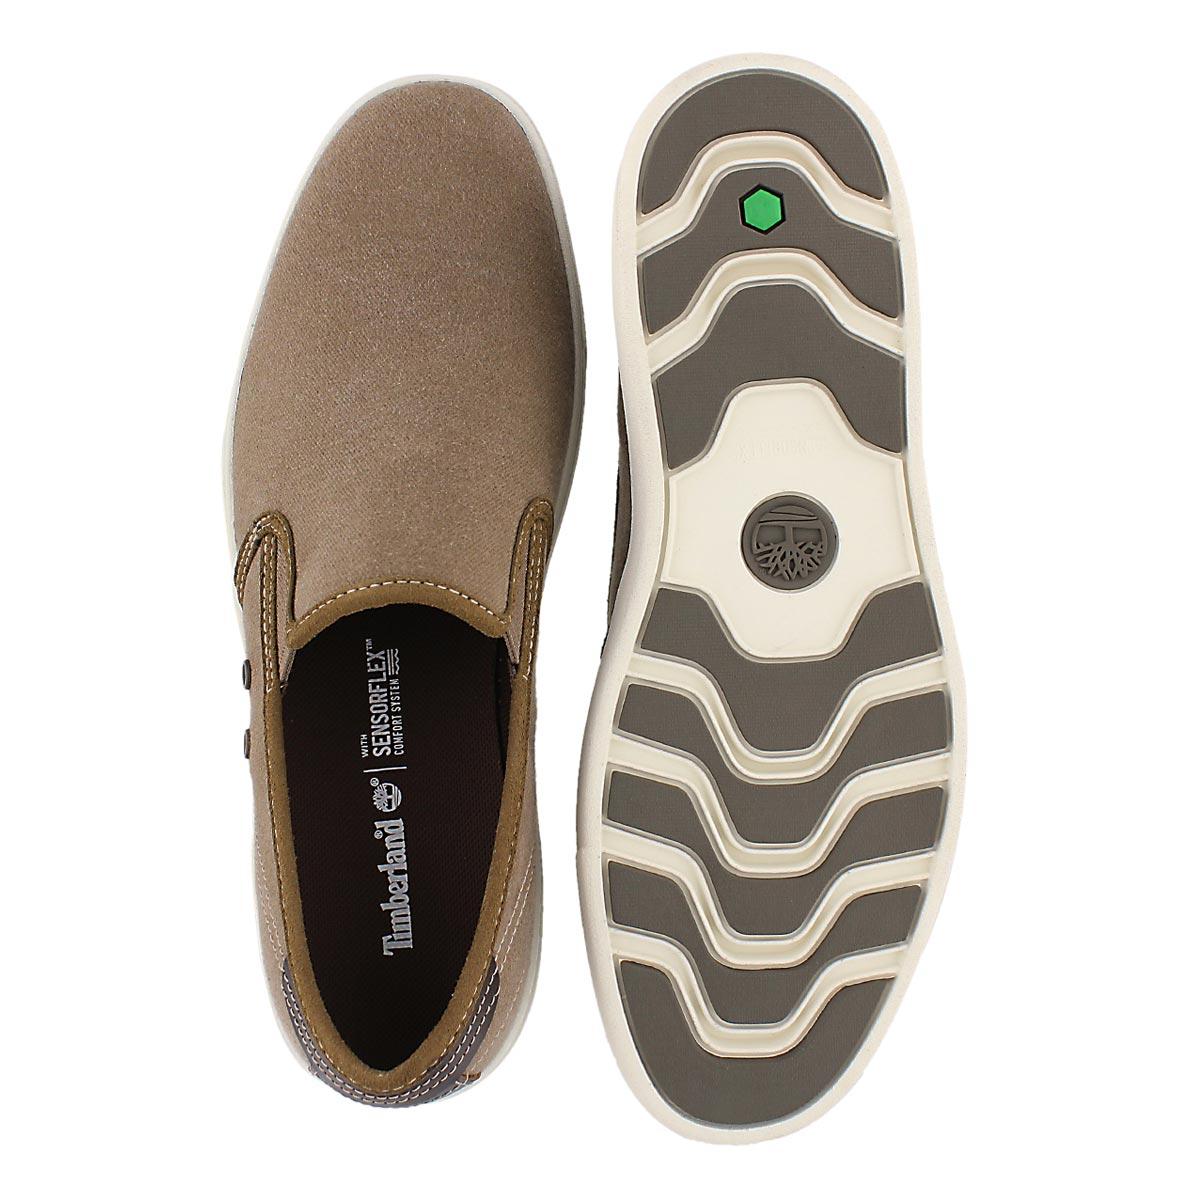 Mns Amherst teak slip on casual shoe